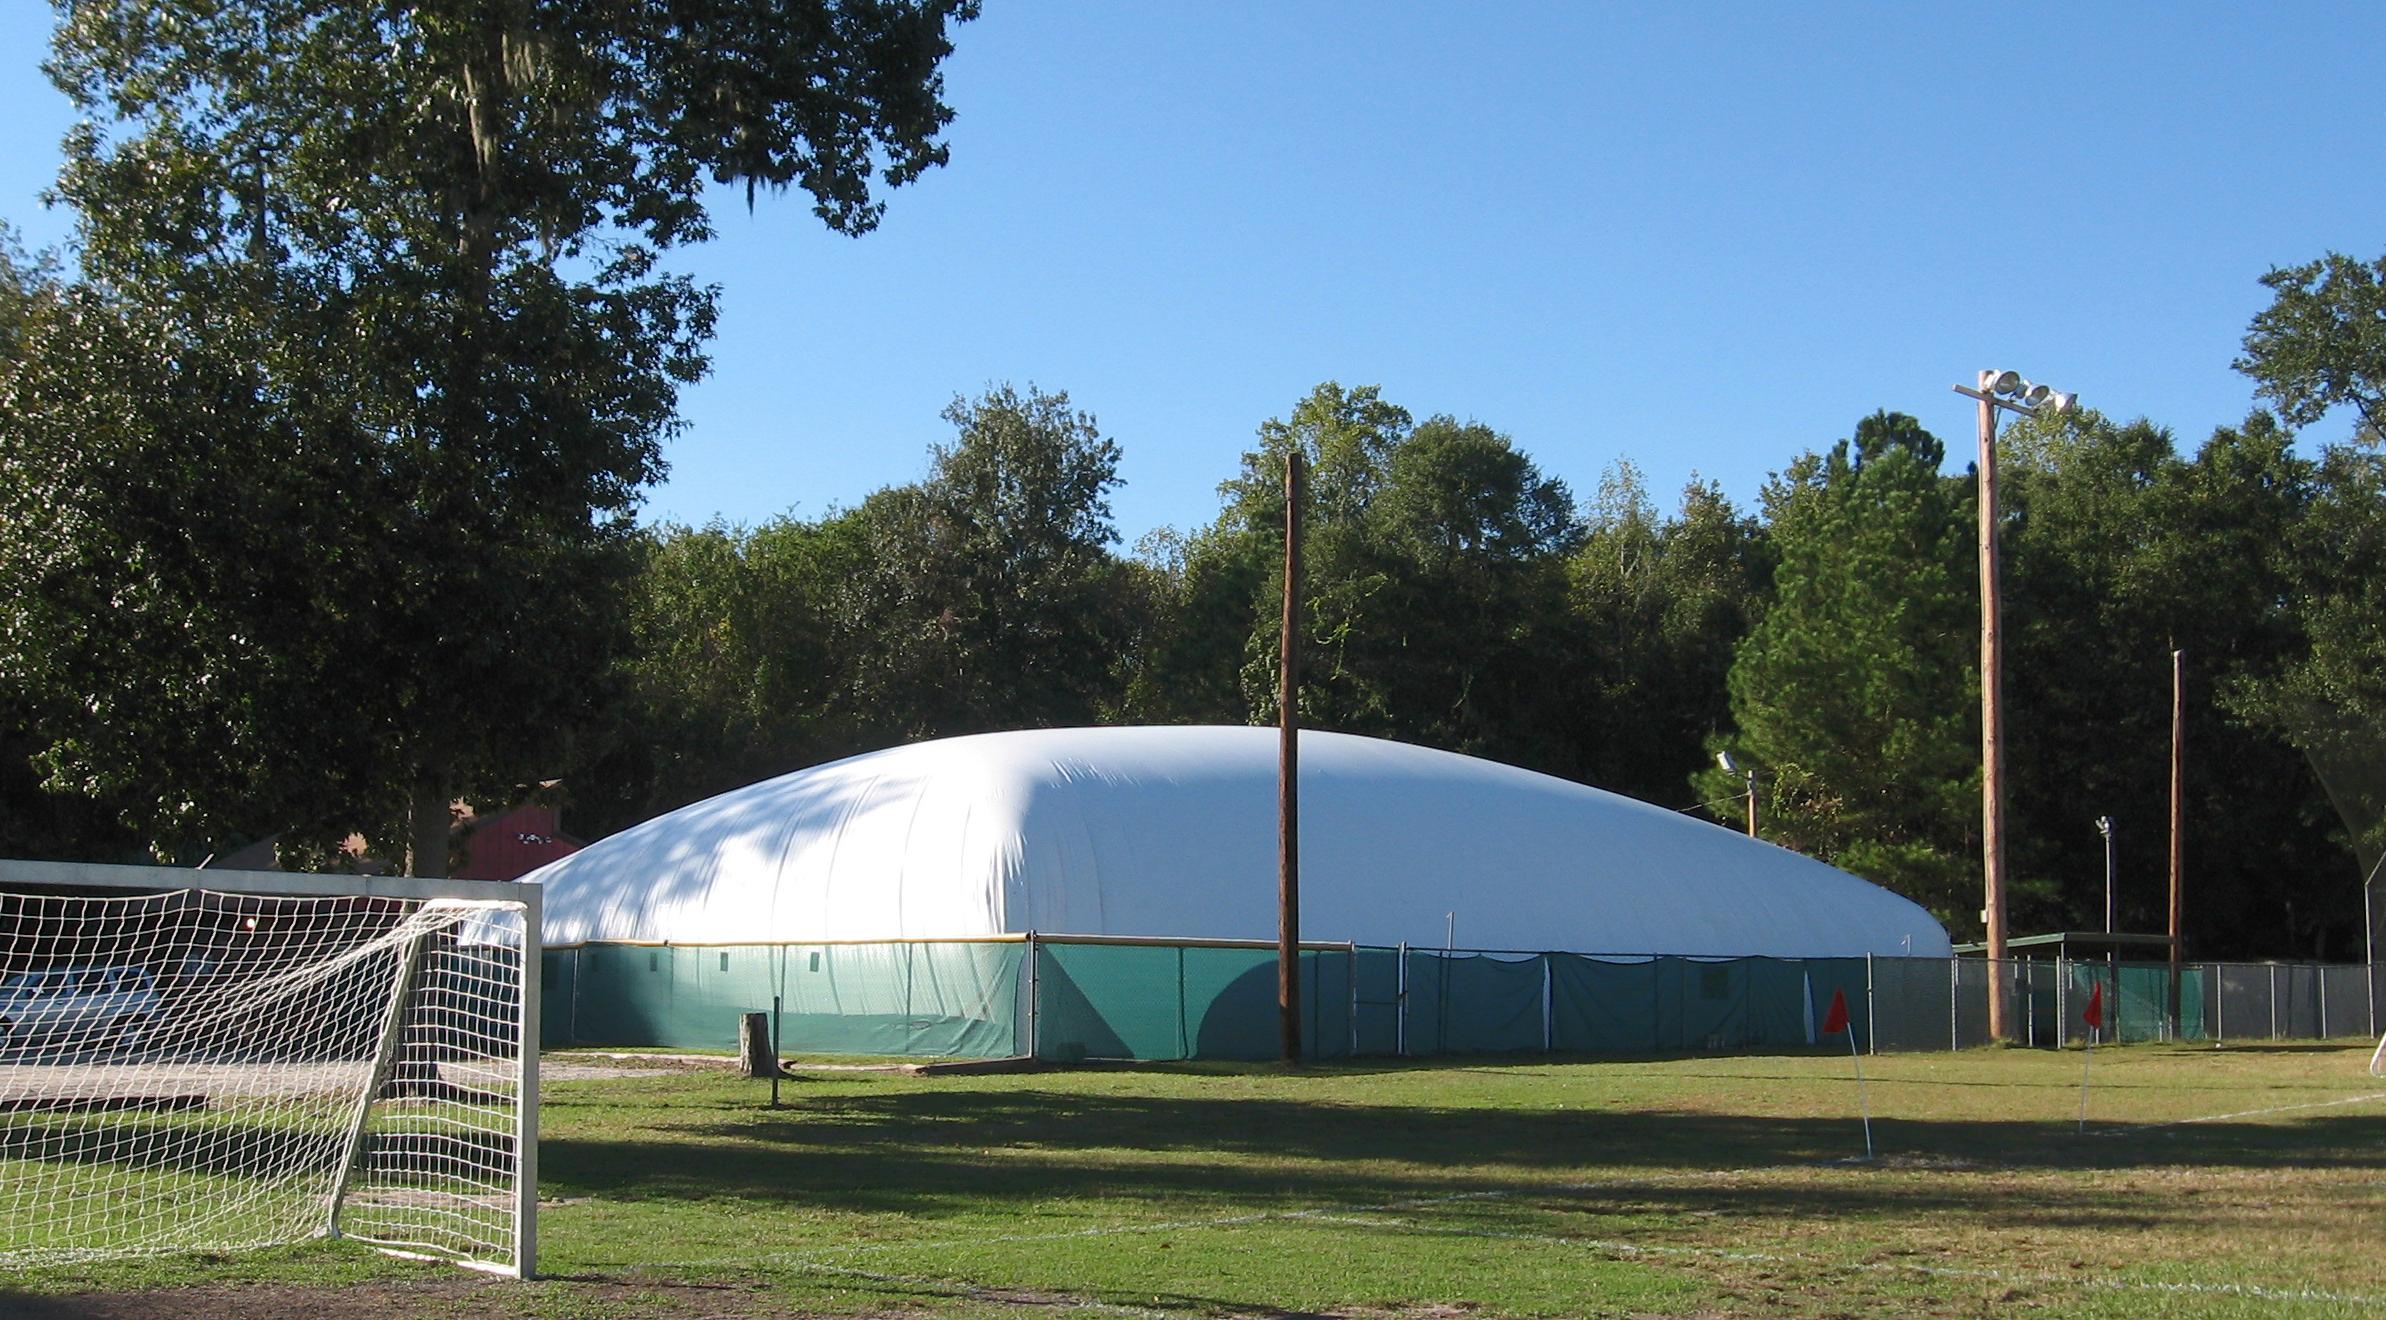 Diy Above Ground Pool Dome DIY Ideas